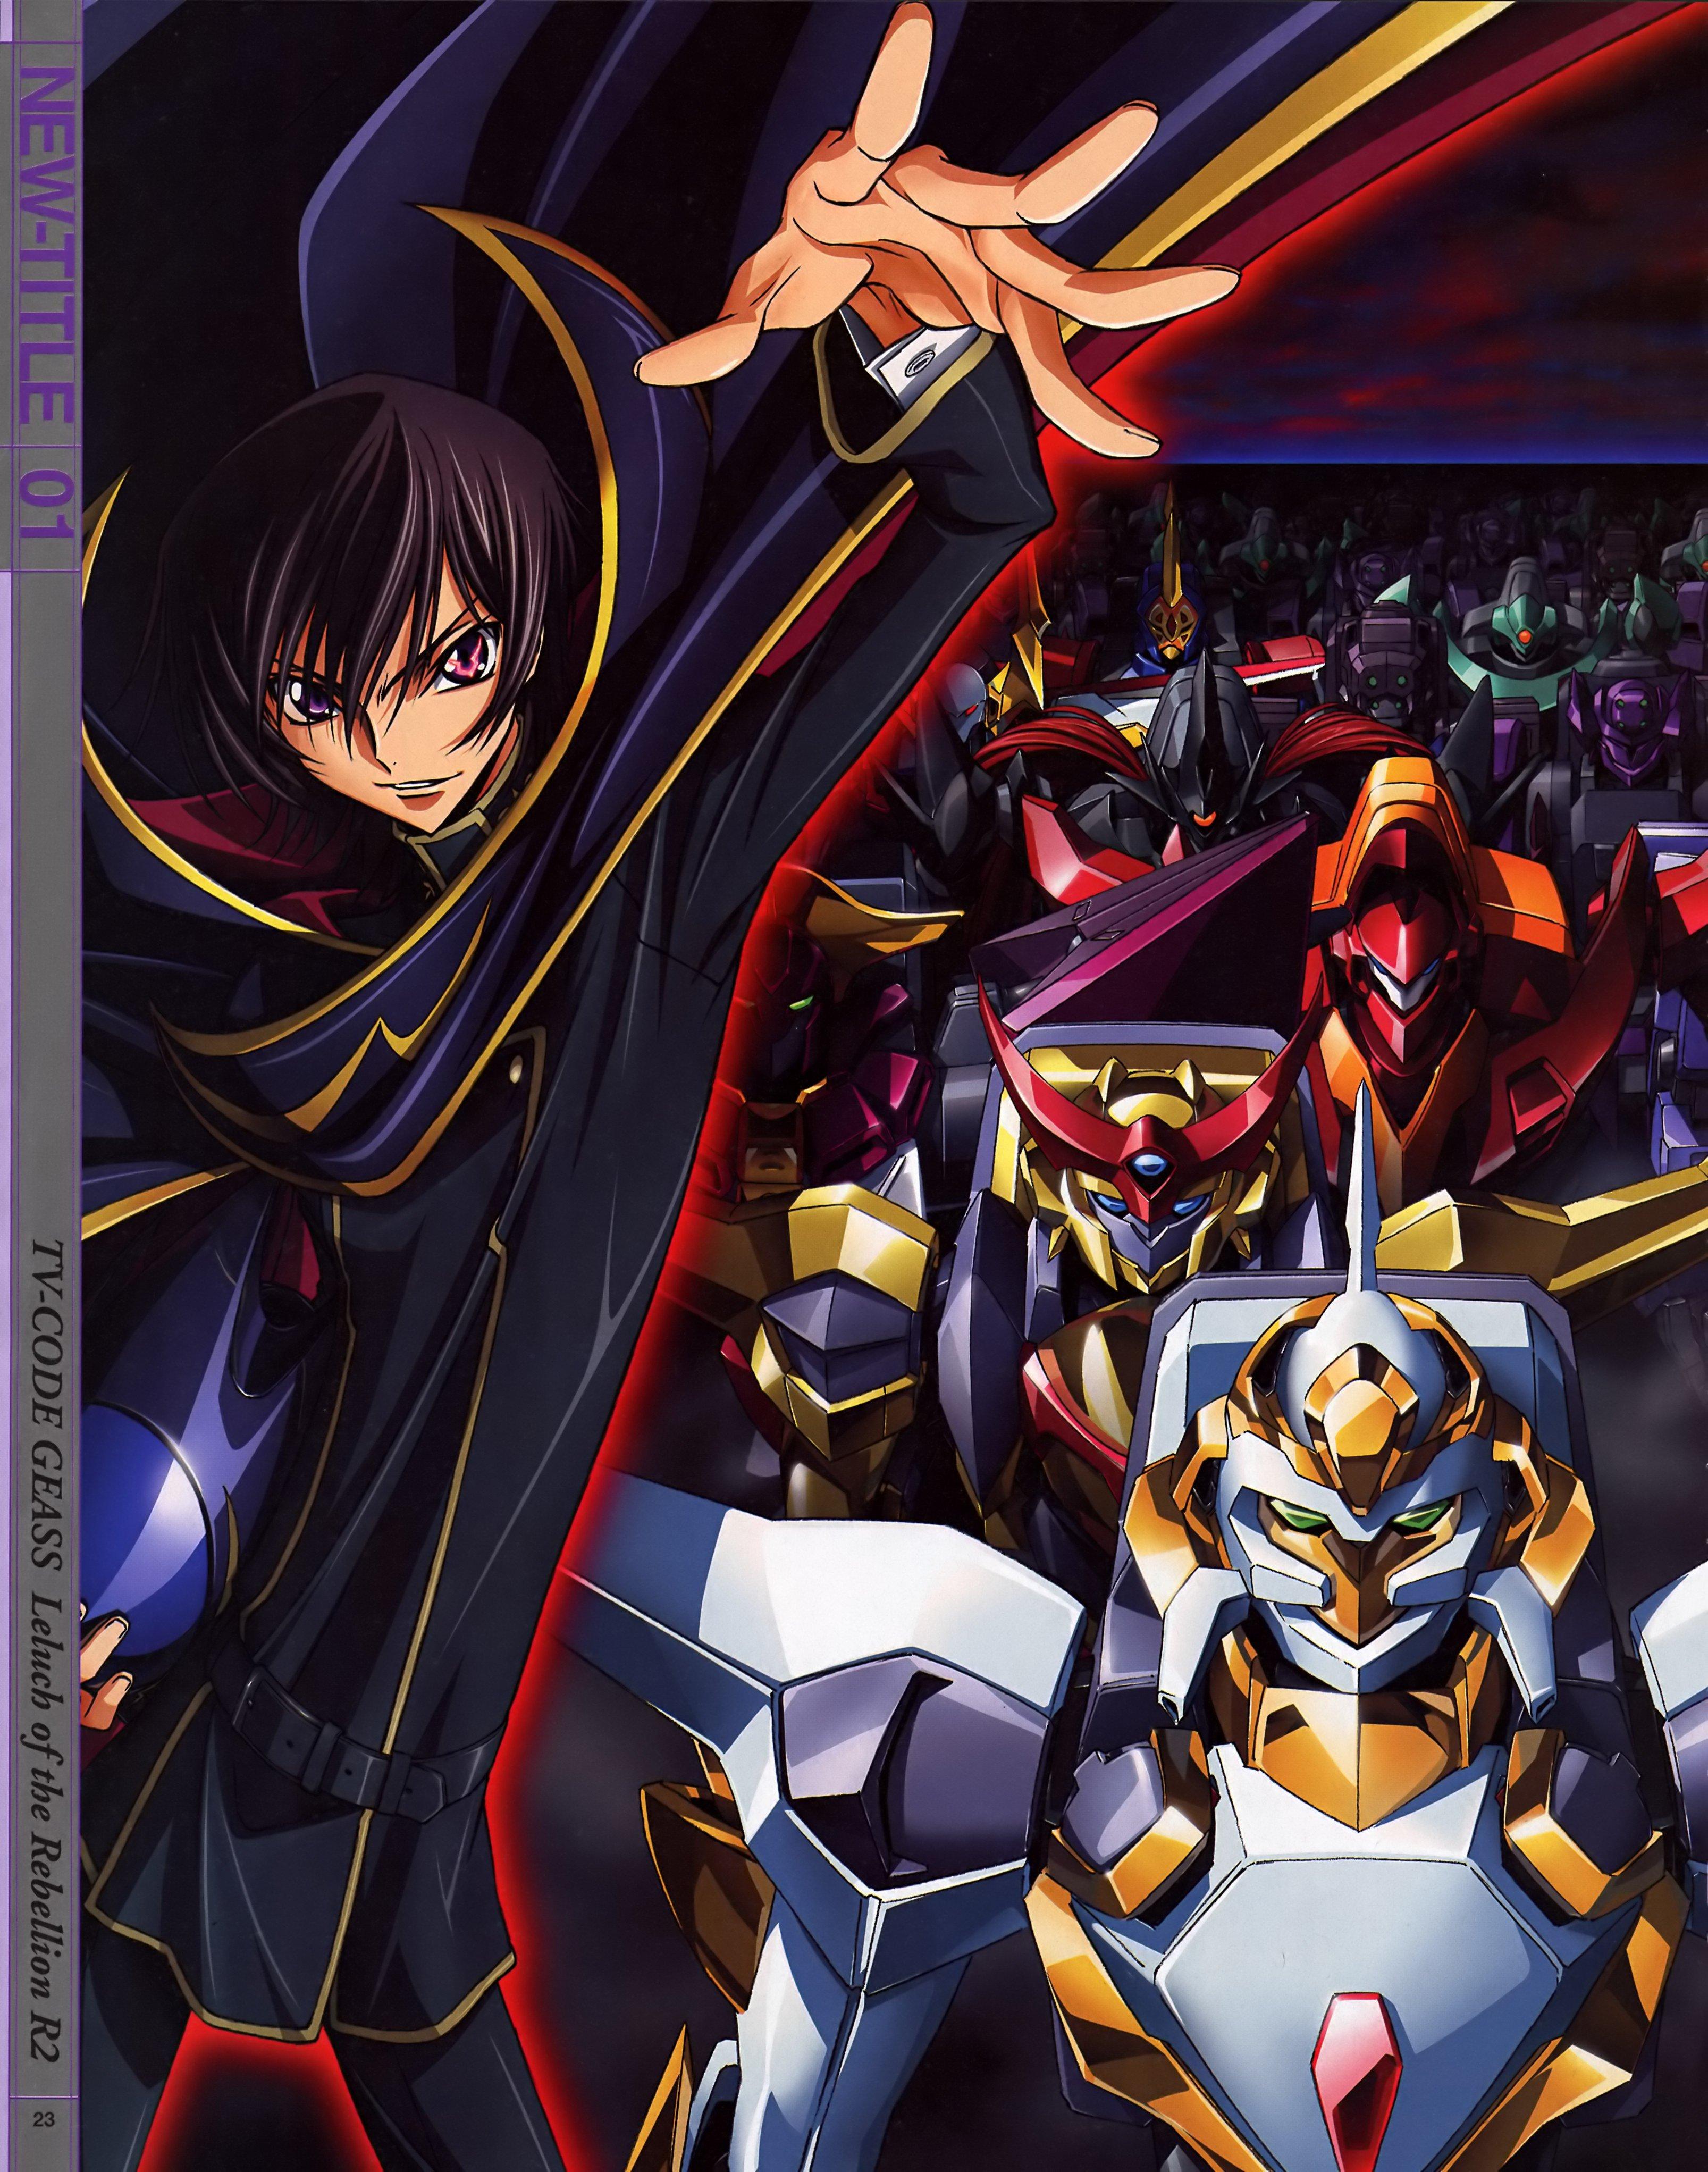 Code Geass Artbook Artwork Lamperouge Lelouch Cover Anime Knightmare Wallpaper